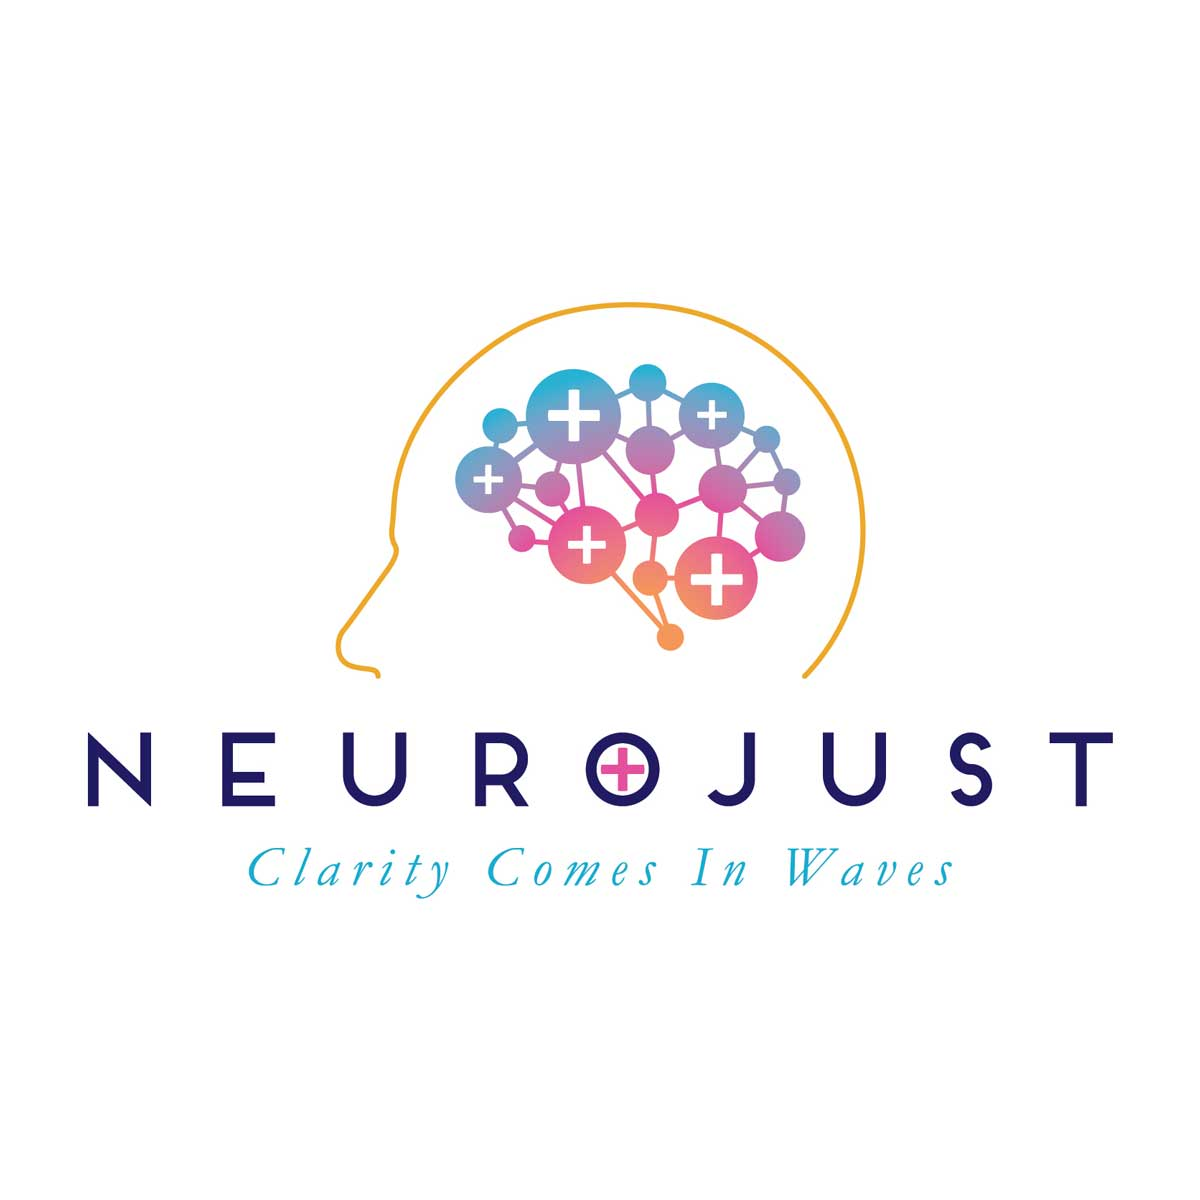 NeuroJust